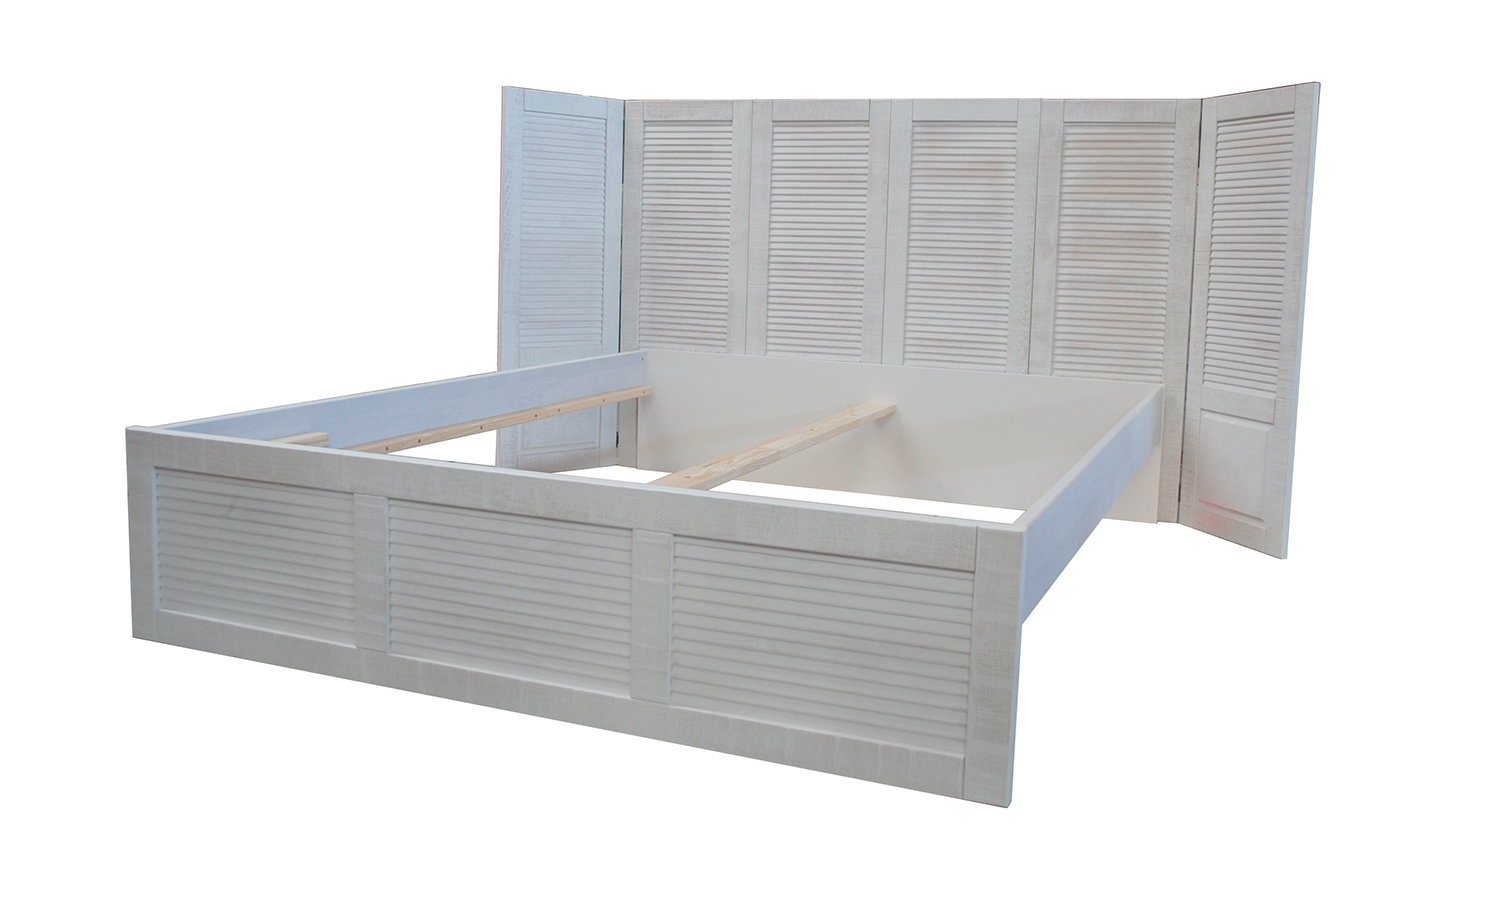 Jalousie Kit 2 Panels Jalousie Bed Room Products